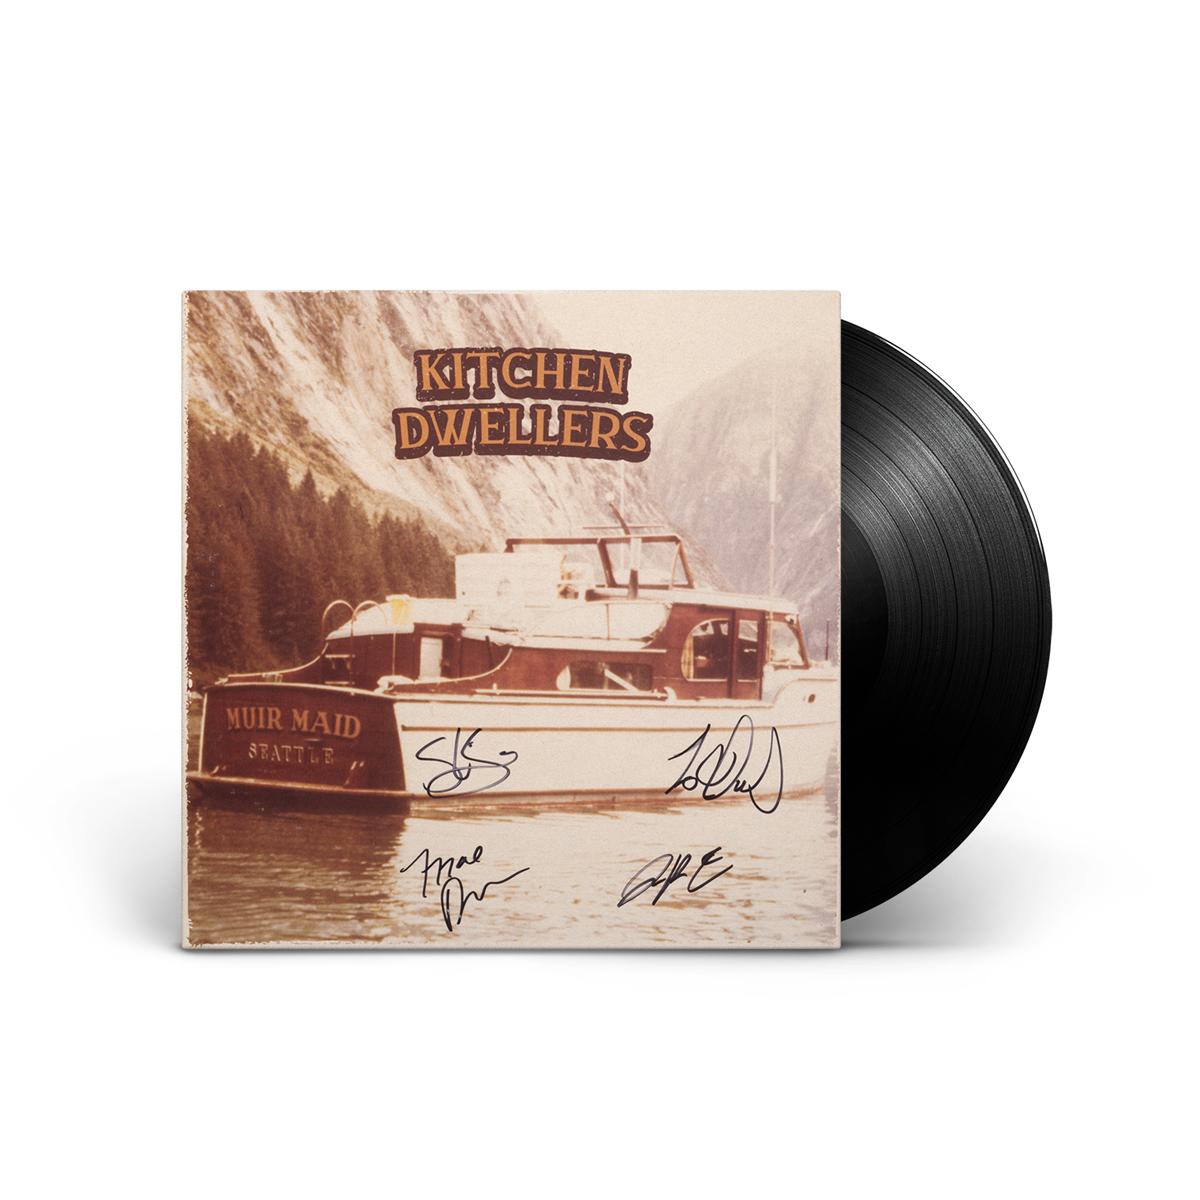 Signed Muir Maid Vinyl